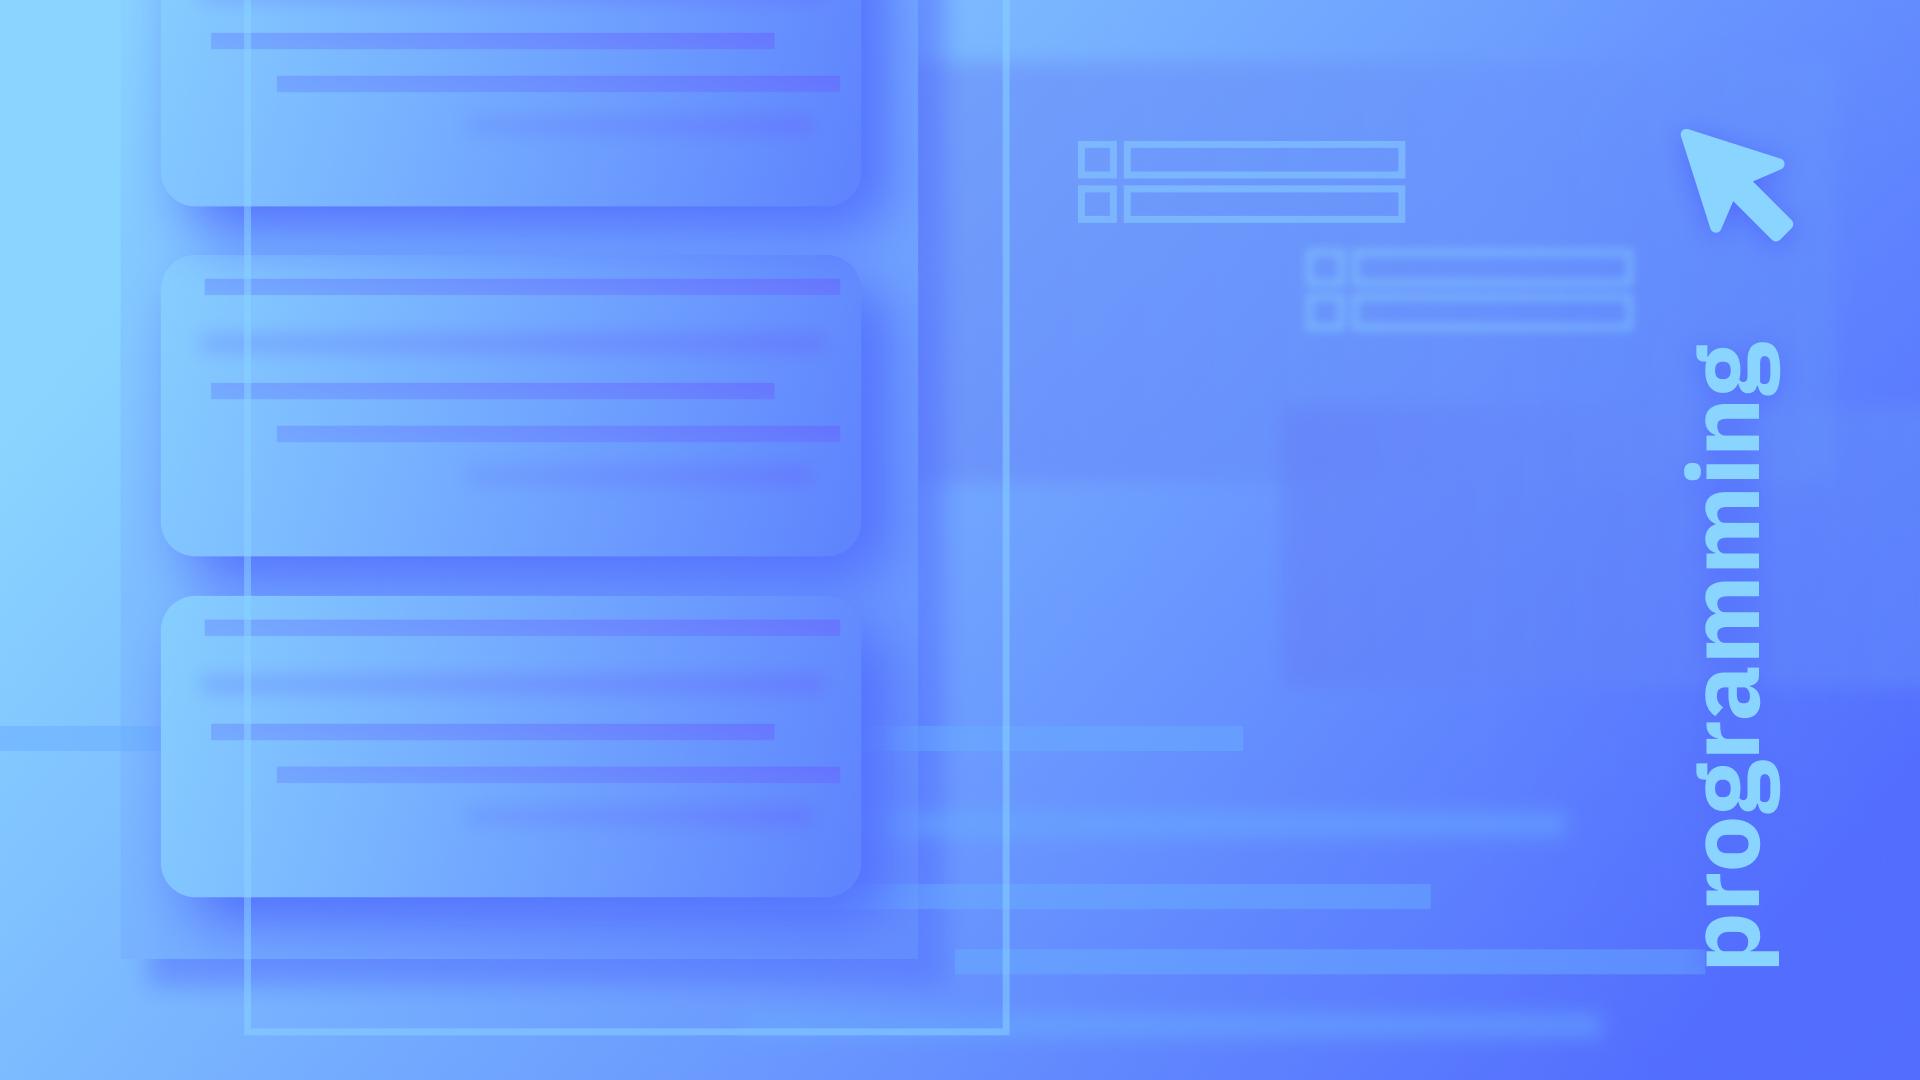 Вебинар Подготовка тестового стенда для работы с Docker на базе Raspberry PI фото